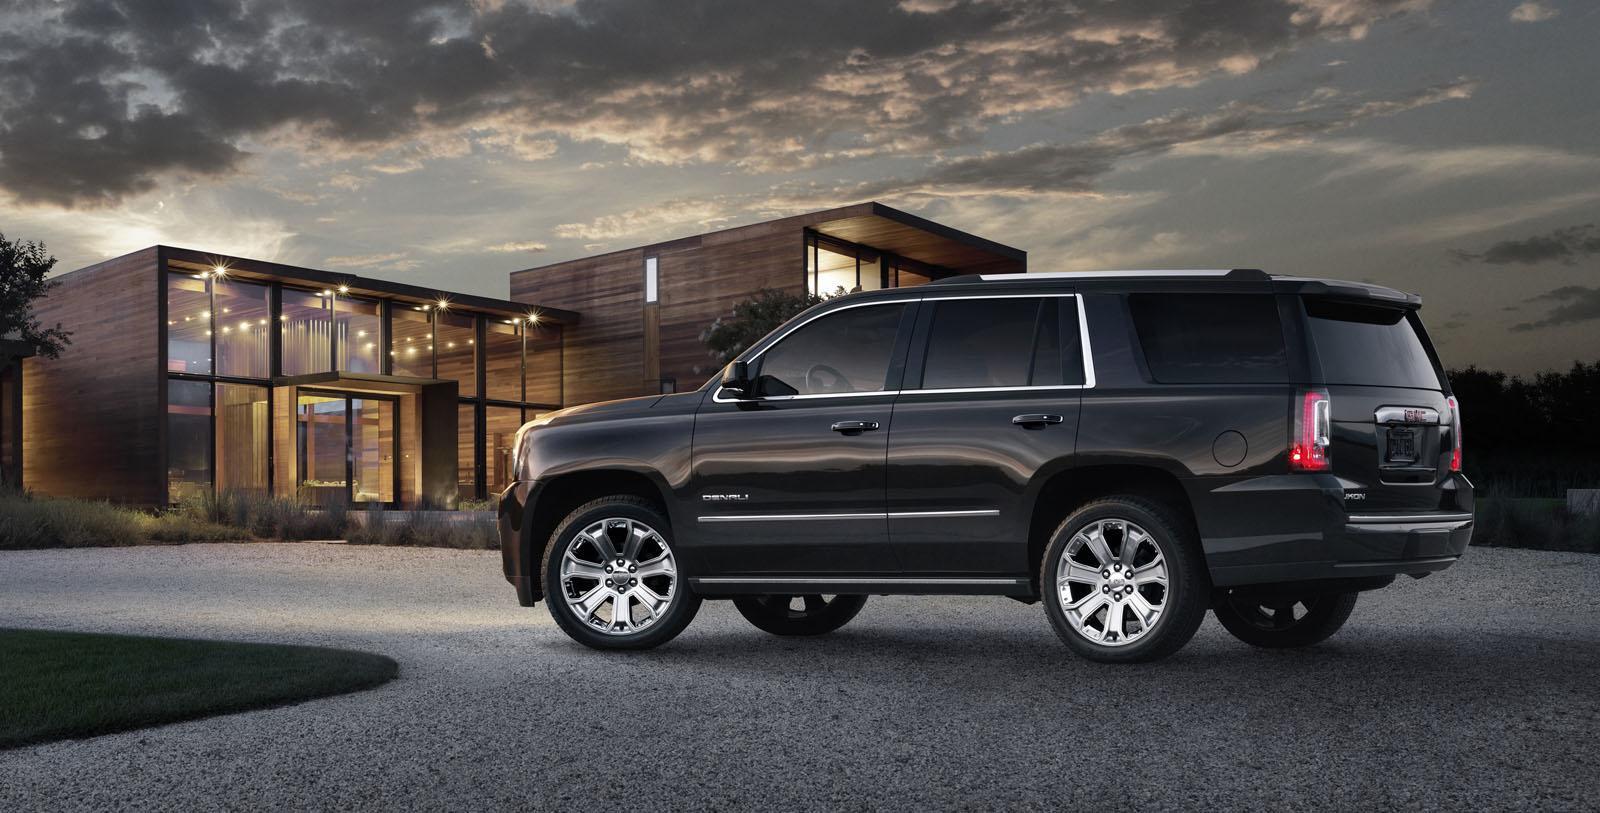 Gmc Acadia For Sale >> 2015 GMC Yukon Denali, Yukon XL Revealed [Video] - autoevolution